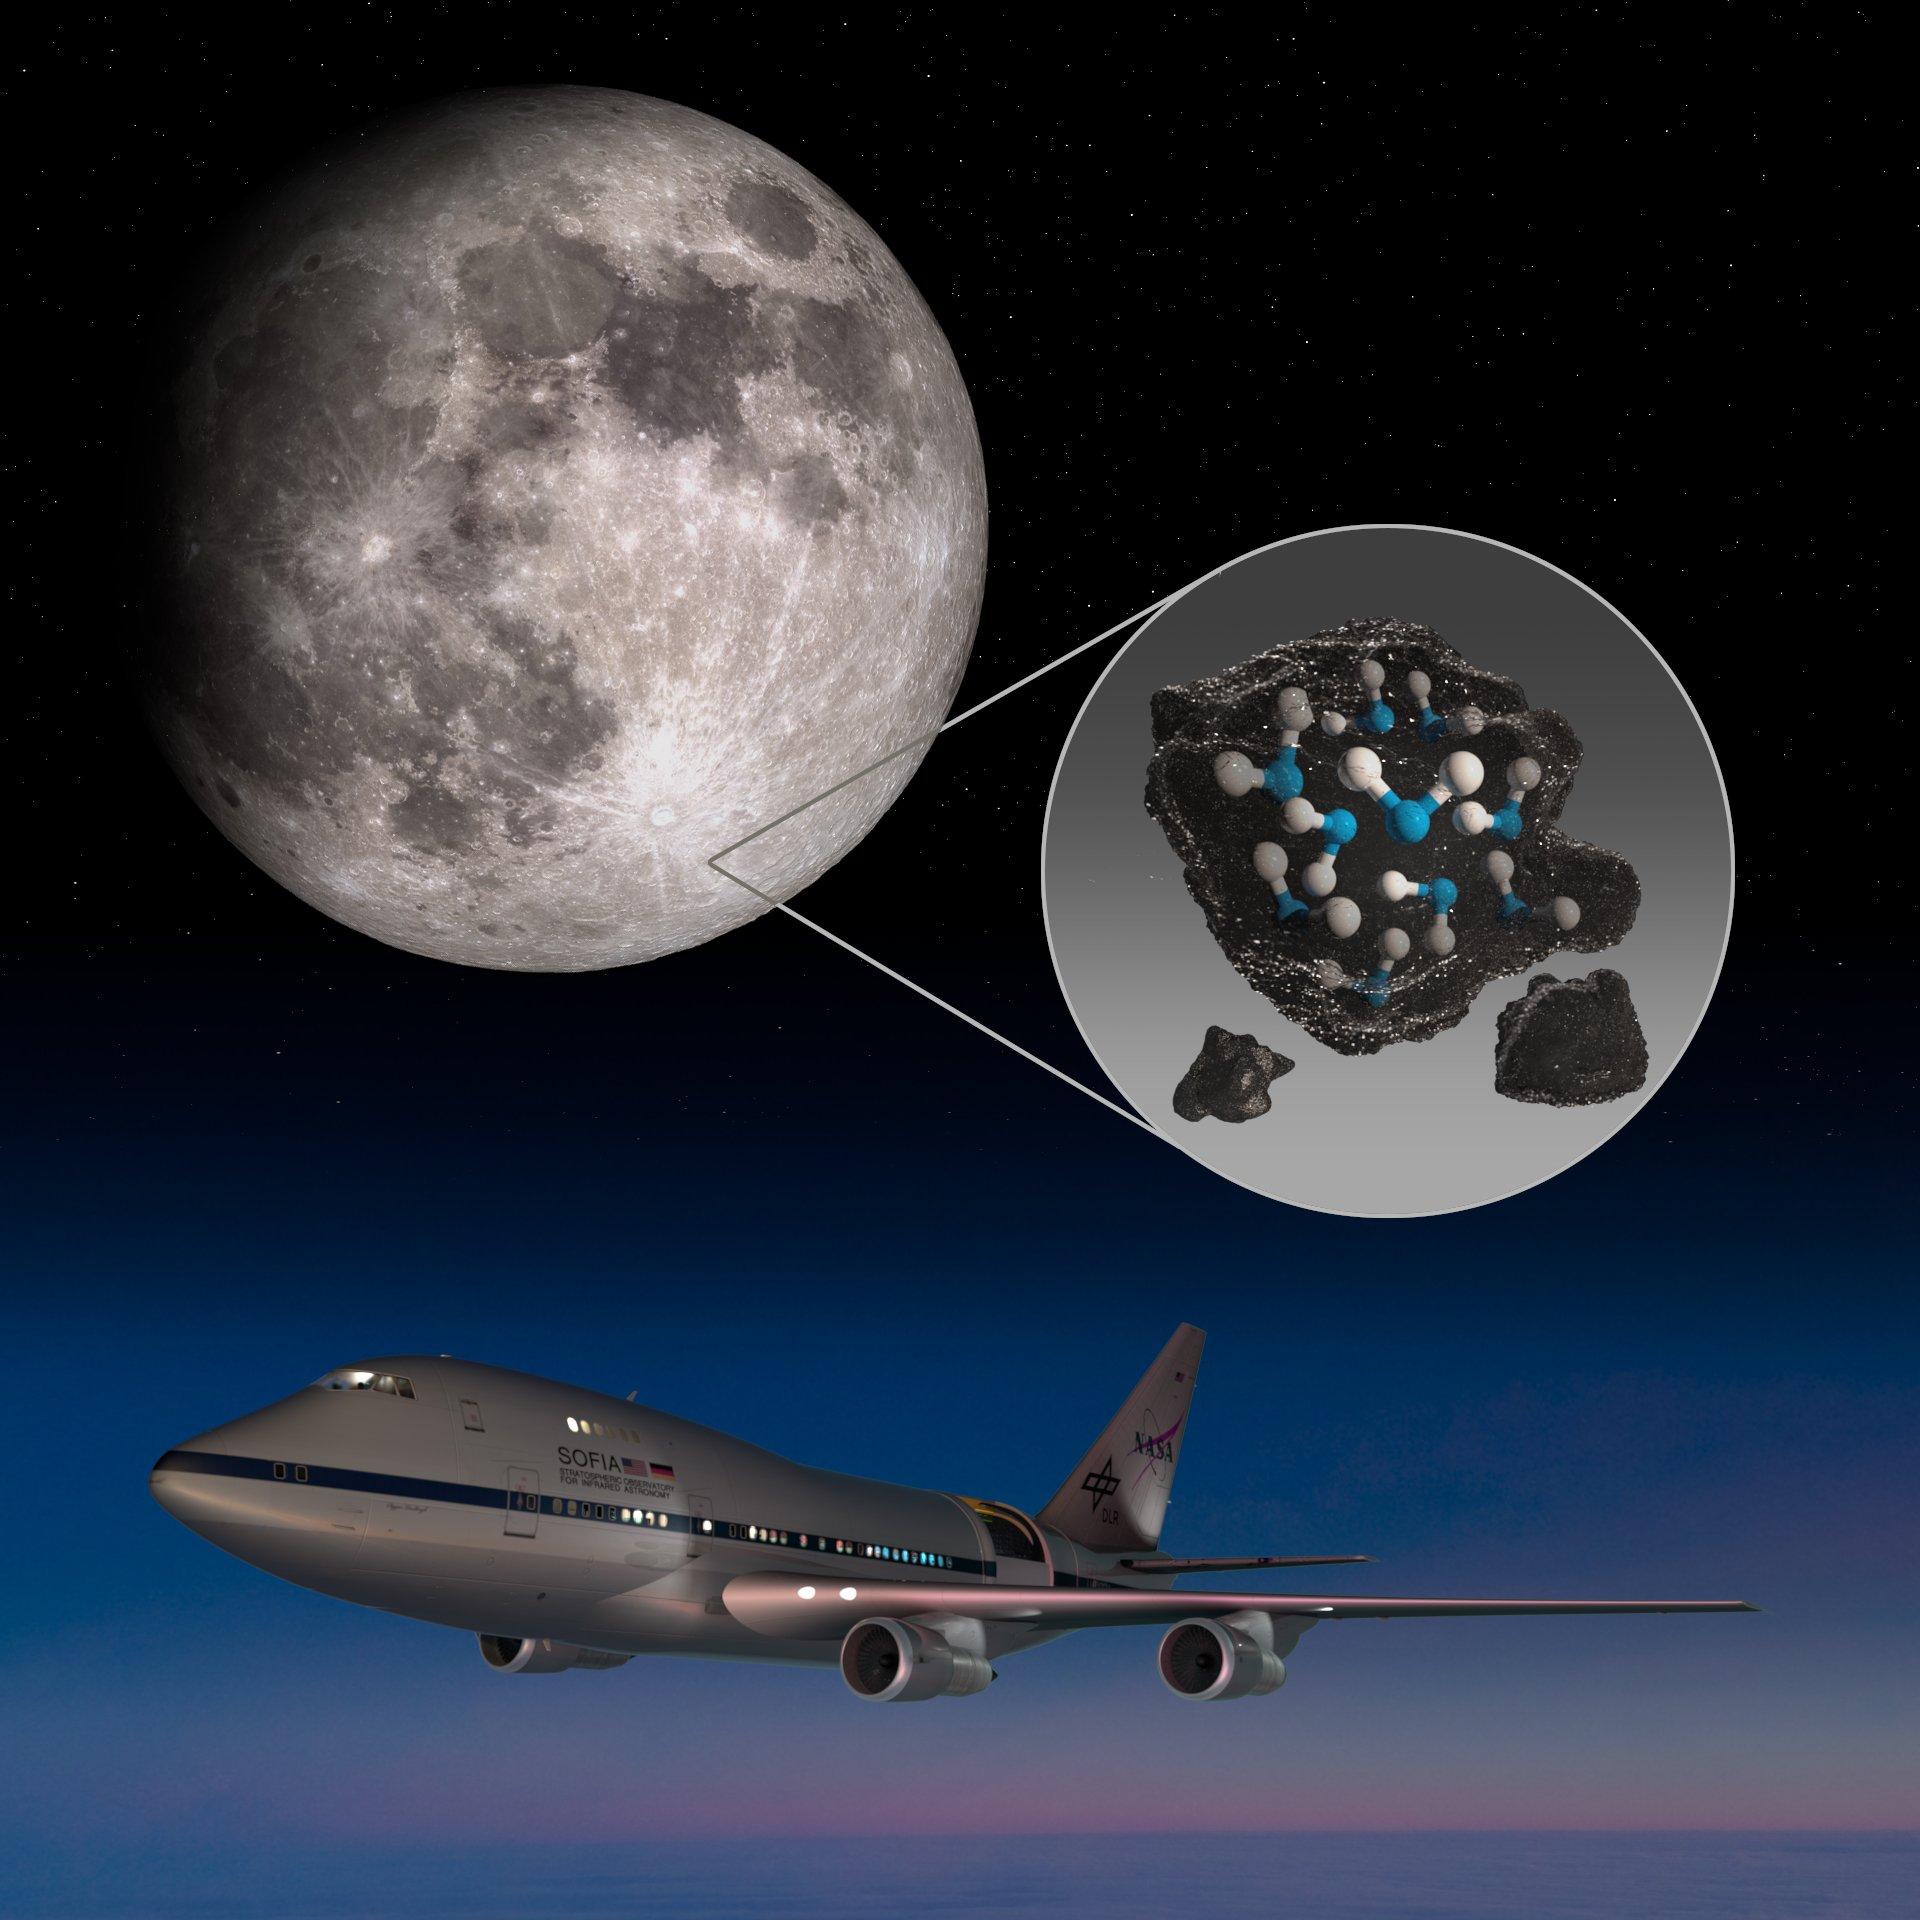 Nasa Sofia Moon Water کشف جدید ناسا از وجود آب بیشتر روی سطح ماه خبر میدهد اخبار IT